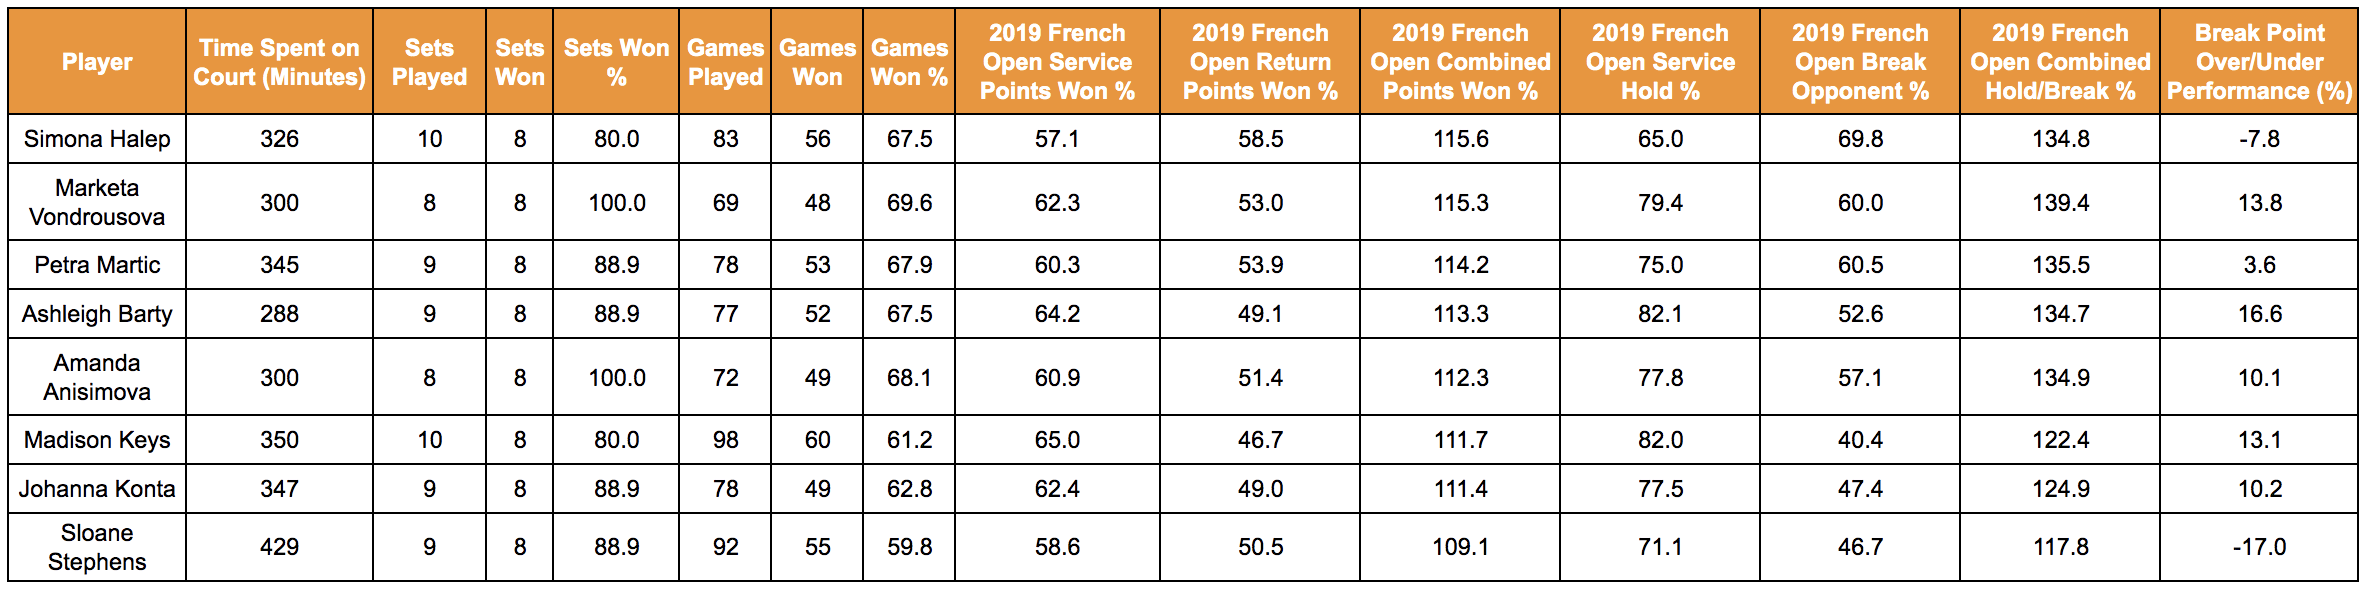 Women's French Open Data